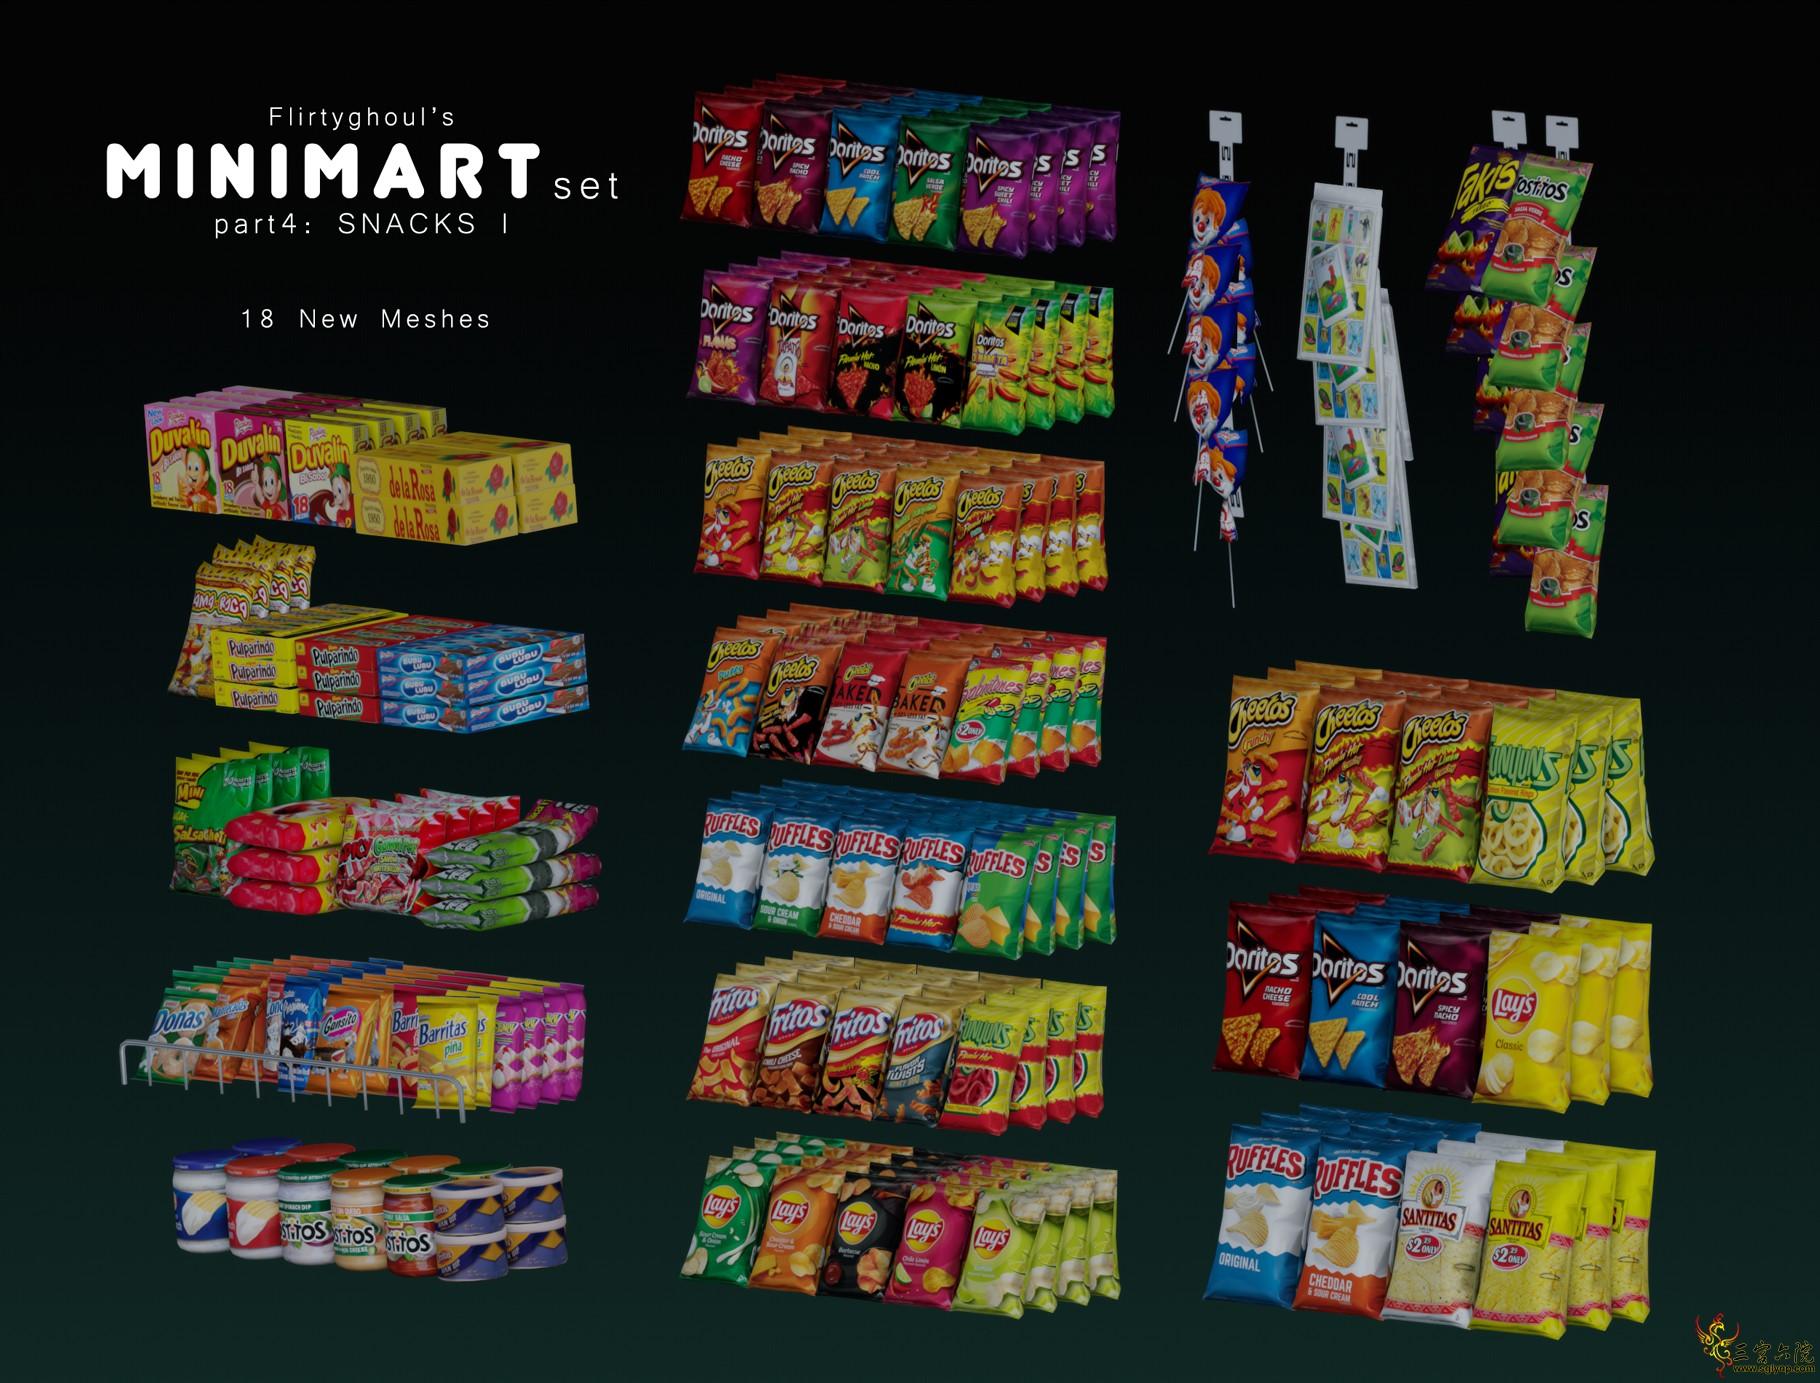 FG_MinimartSet_SNACKS1PREV1.png